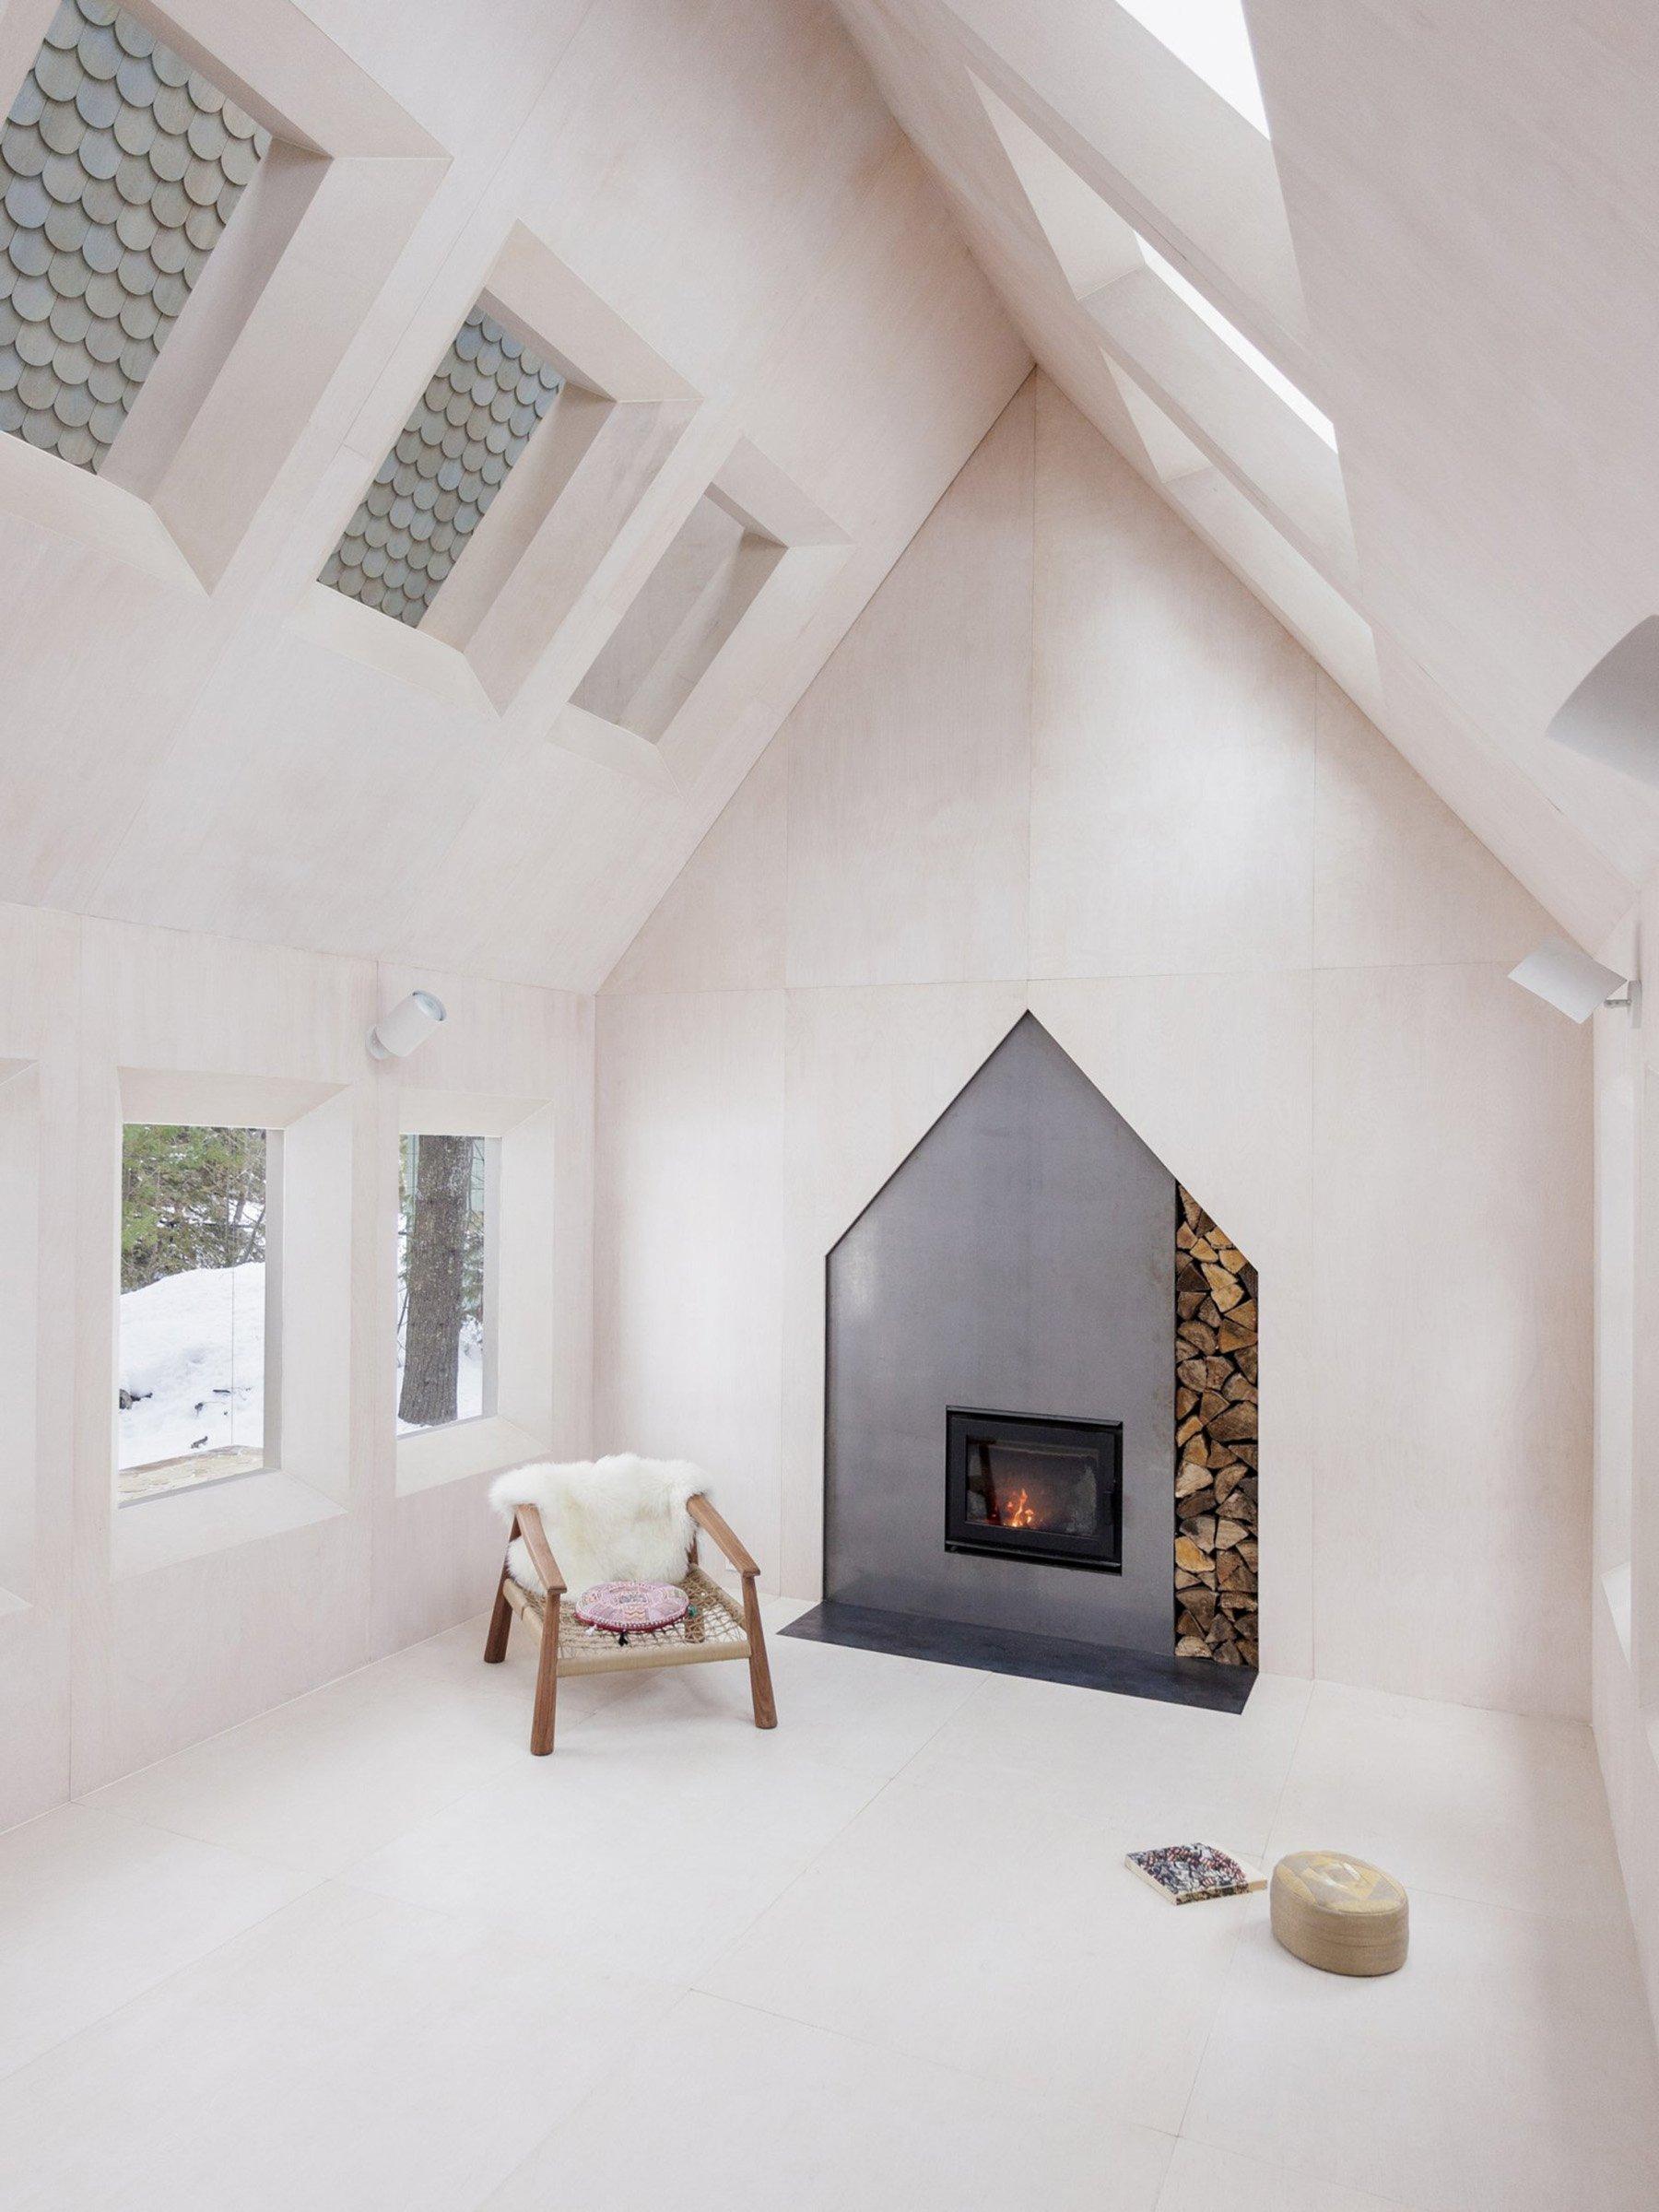 iGNANT-Architecture-UUfie-The-Lake-Cottage-10